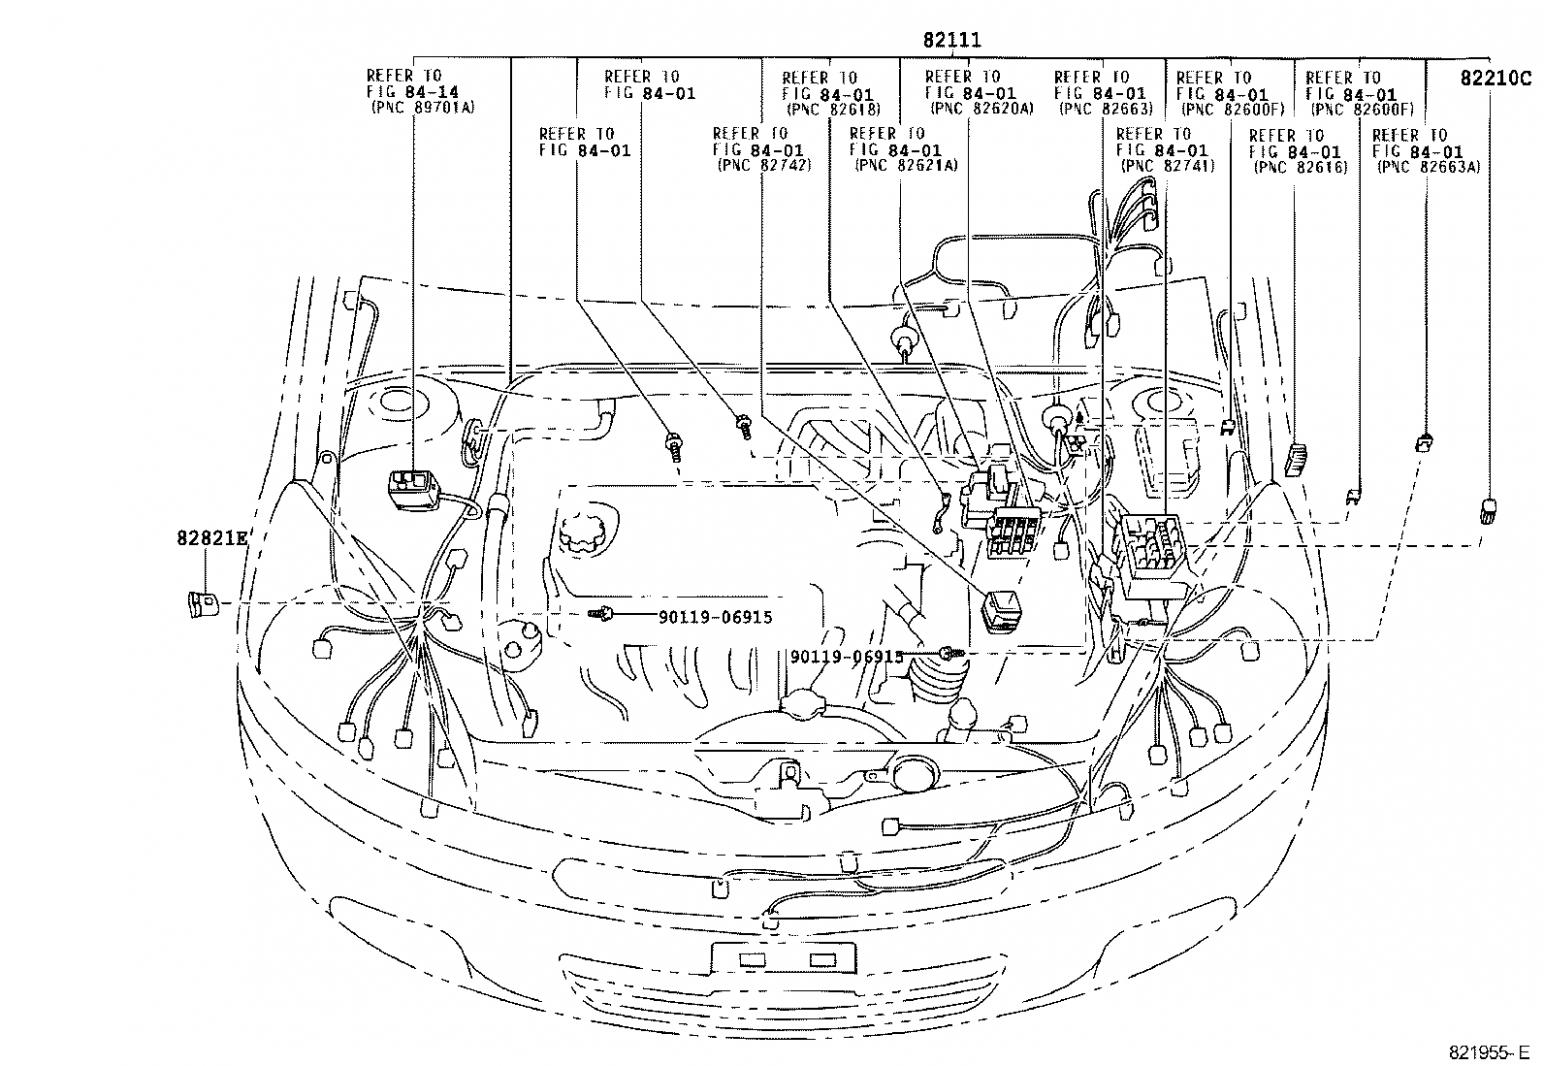 2011 Toyota Yaris Engine Diagram - Wiring Diagram Recent make-zone -  make-zone.cosavedereanapoli.it | 2007 Toyota Yaris Engine Diagram |  | make-zone.cosavedereanapoli.it